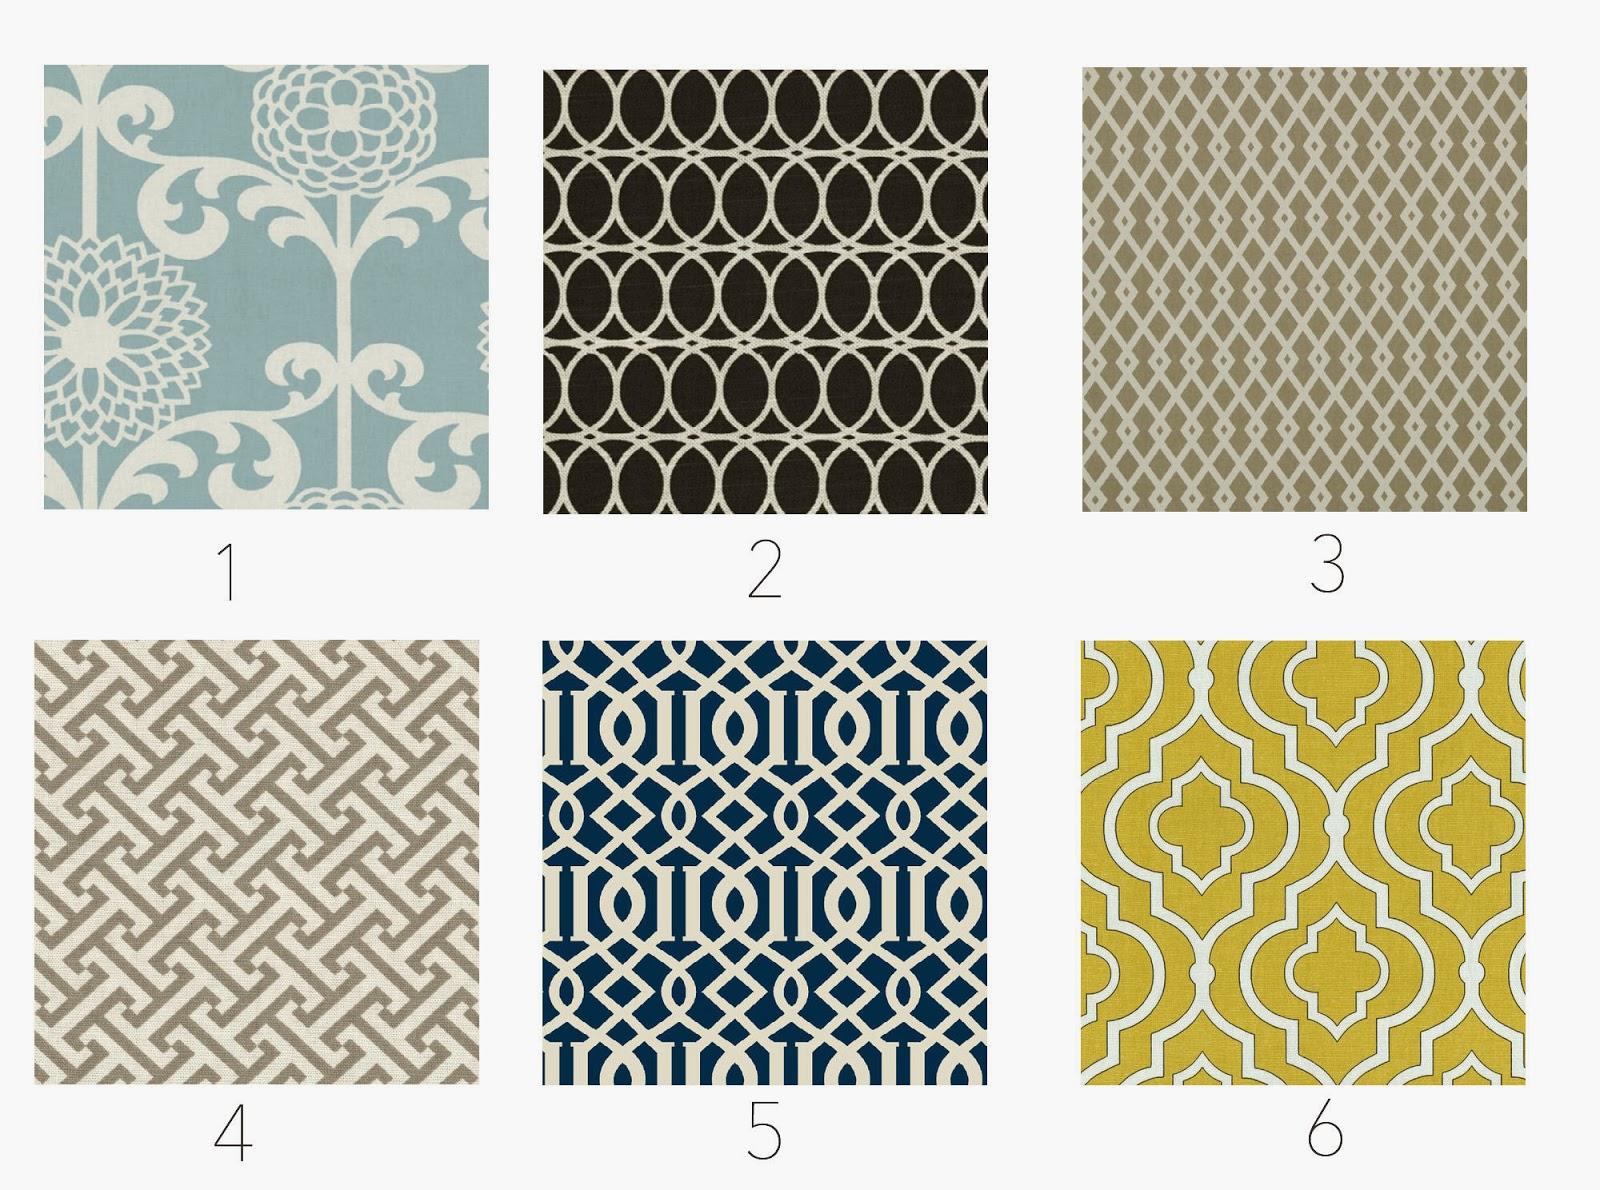 favorite home decor fabric at joann fabrics little home decor print fabric davon yellow jo ann